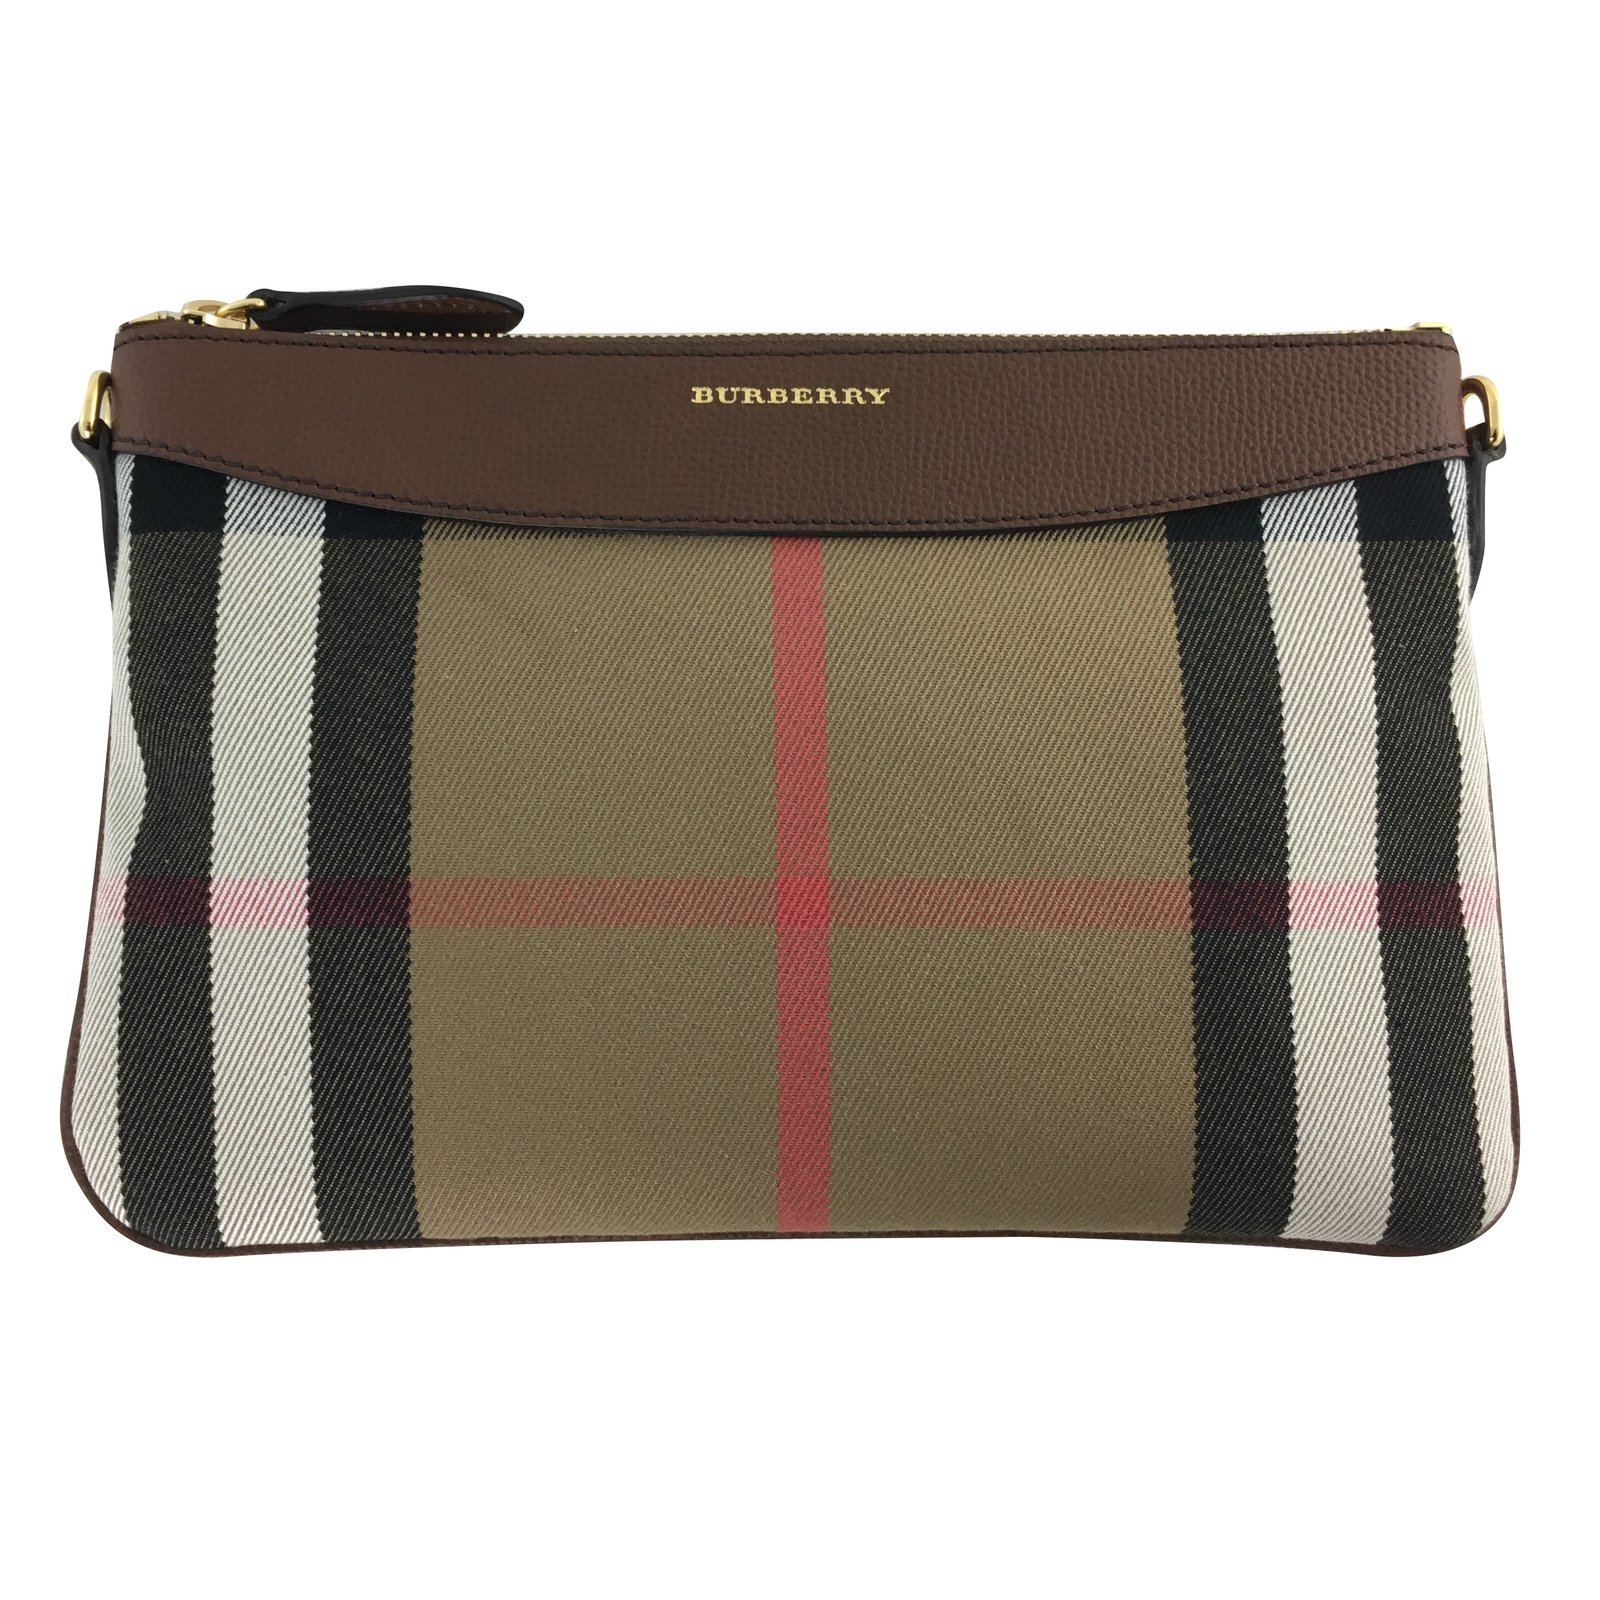 Burberry Clutch Bag Handbags Leather Other ref.74222 - Joli Closet b076fa7d1b314